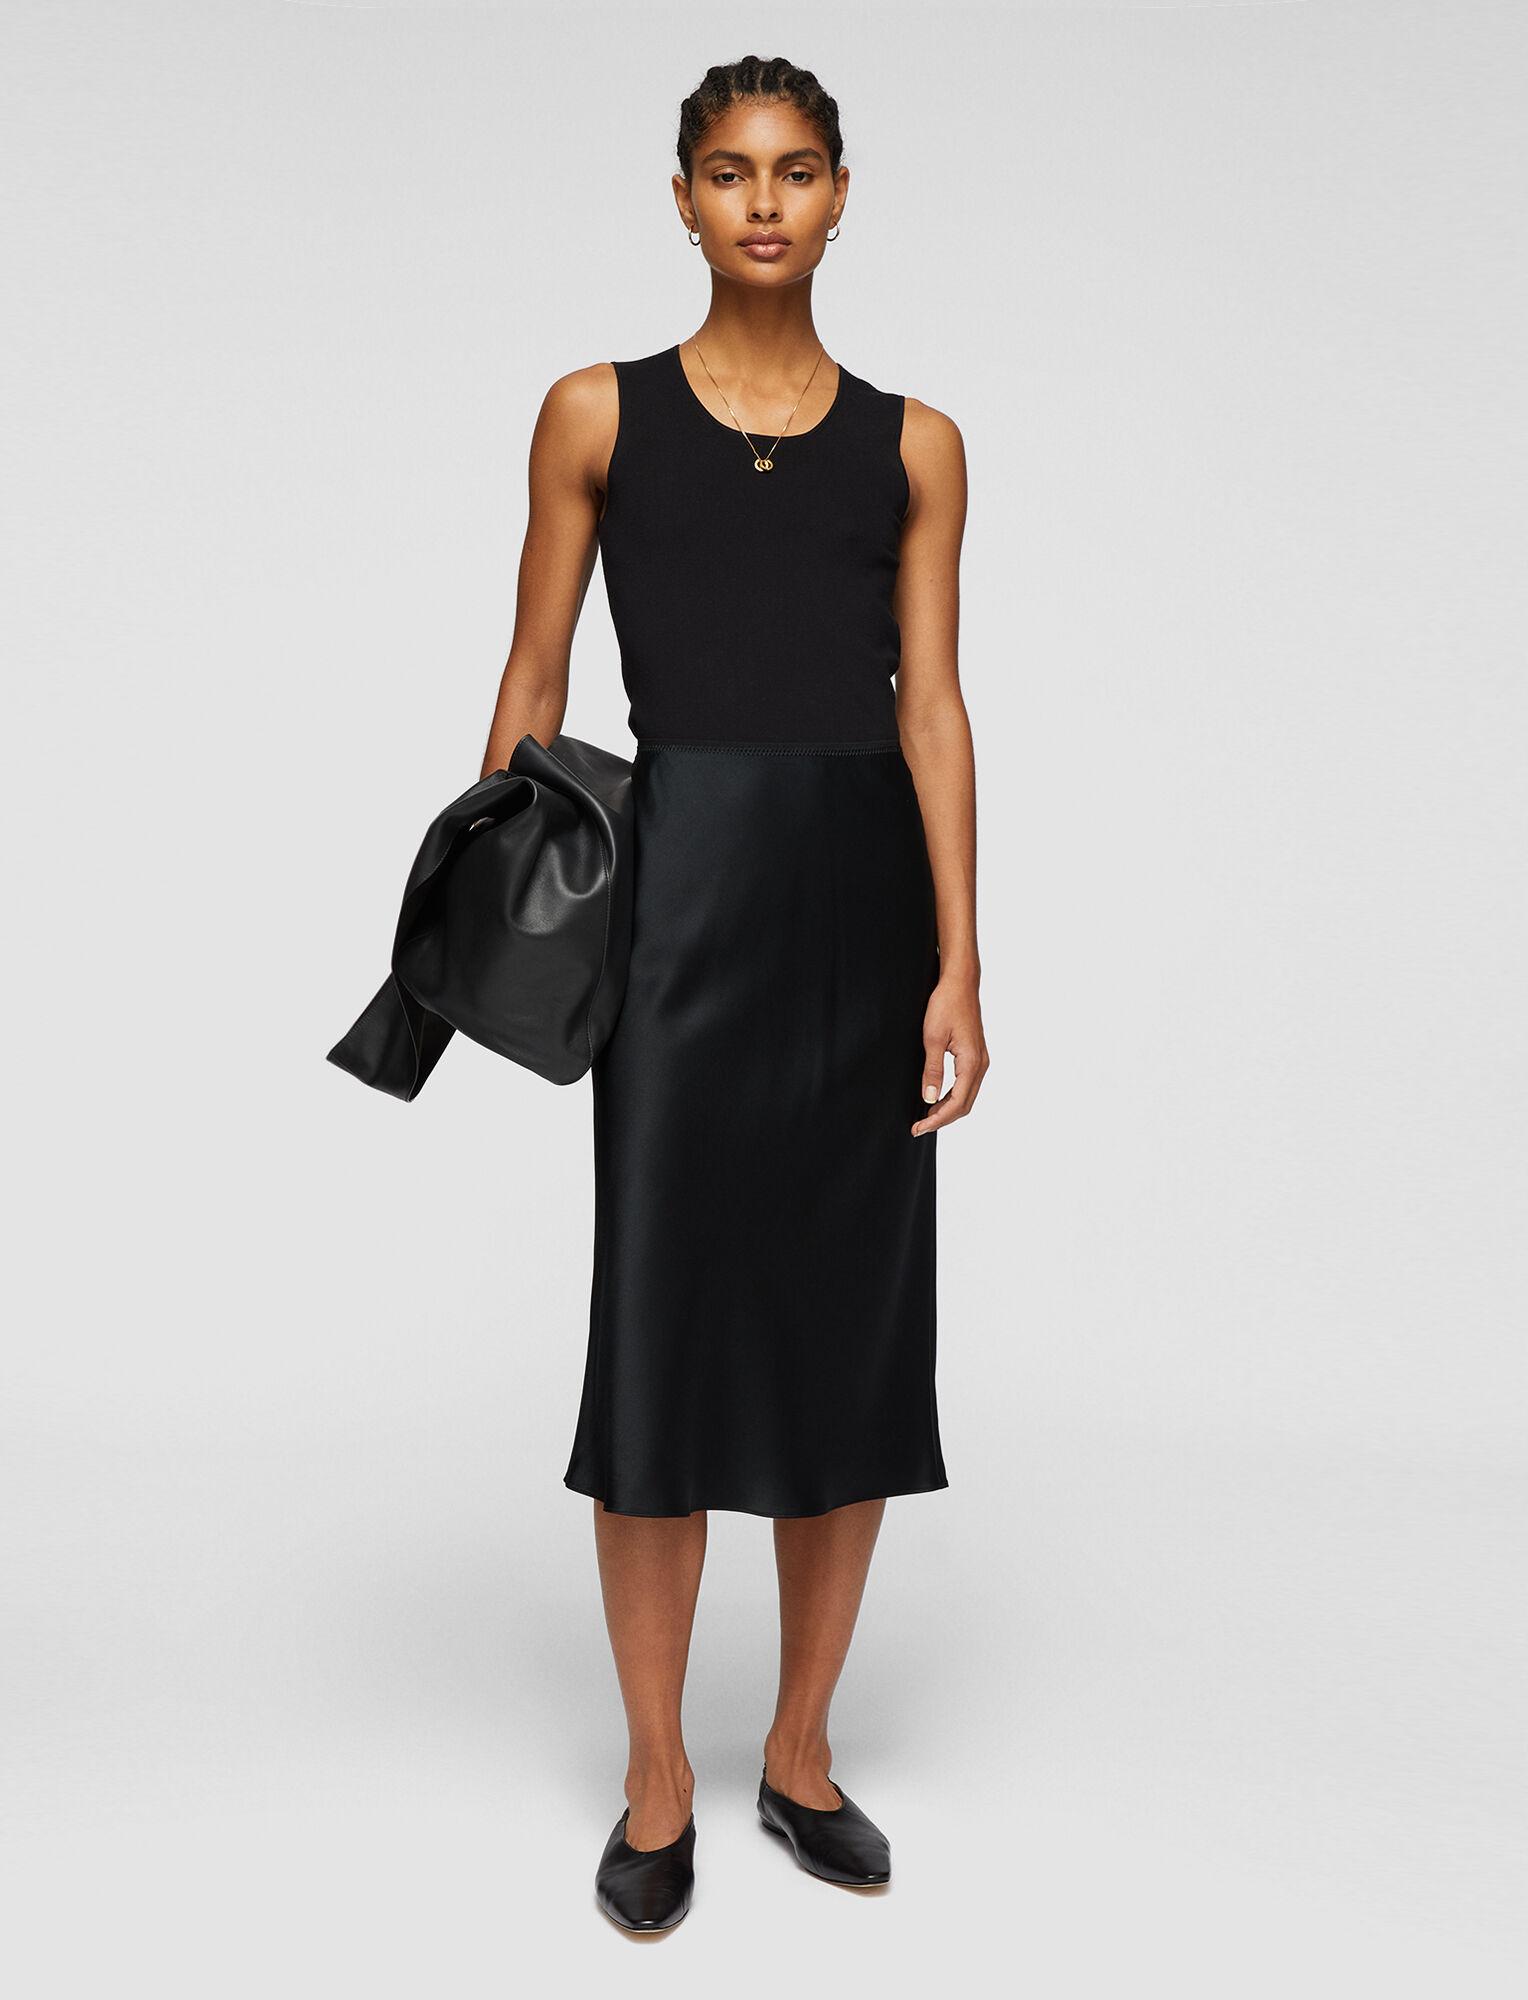 Joseph, Silk Satin Isaak Skirt, in BLACK